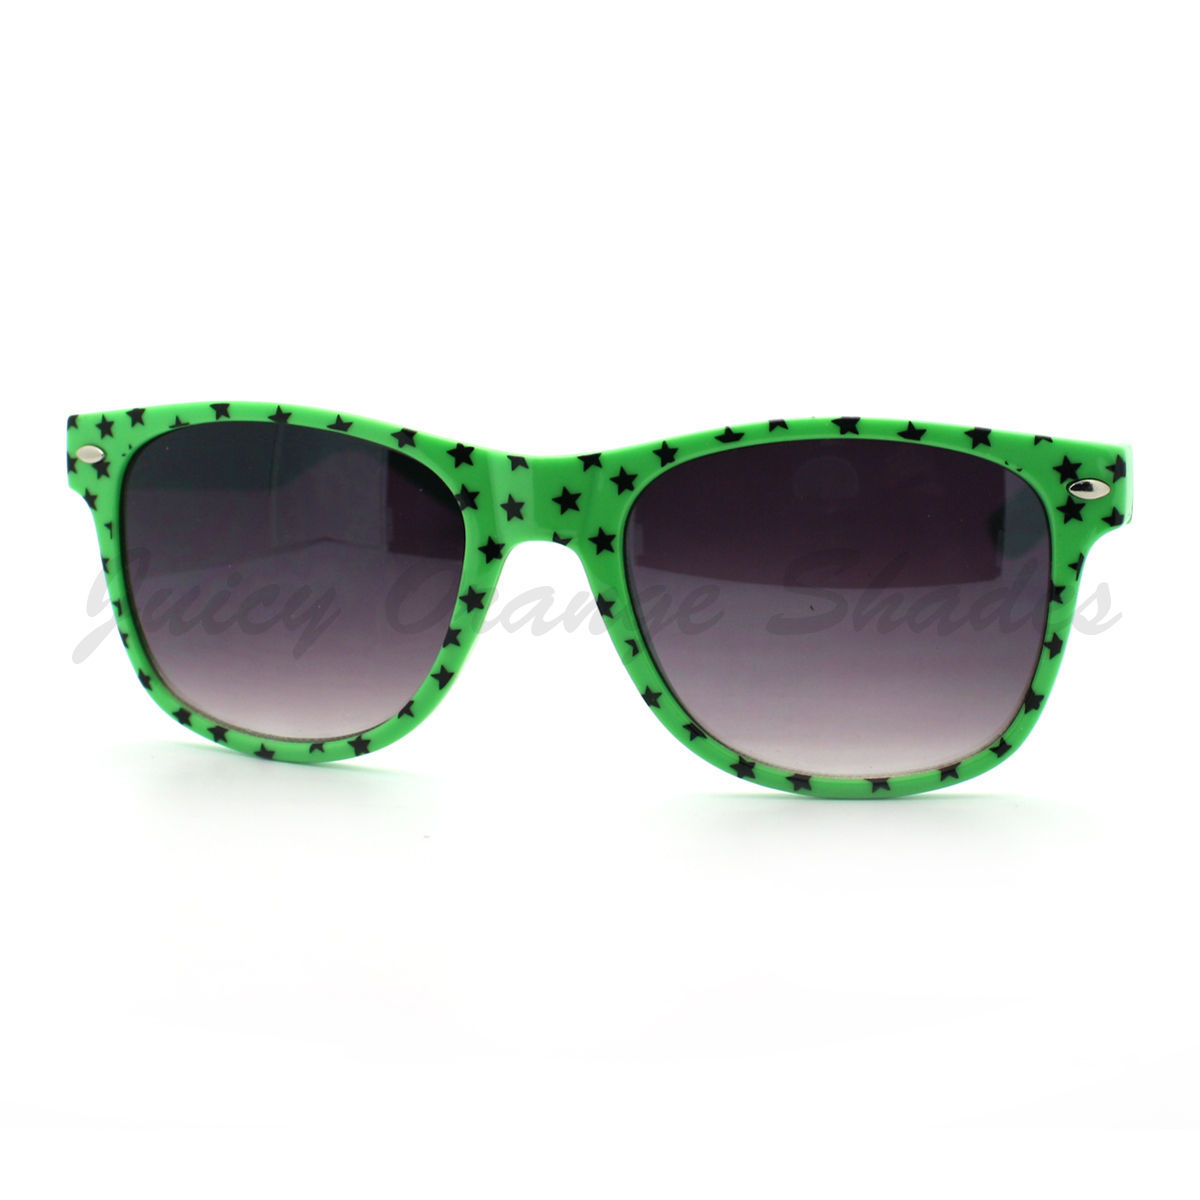 Stars Print Sunglasses Classic Square Horn Rimmed Frame (Spring Hinge)